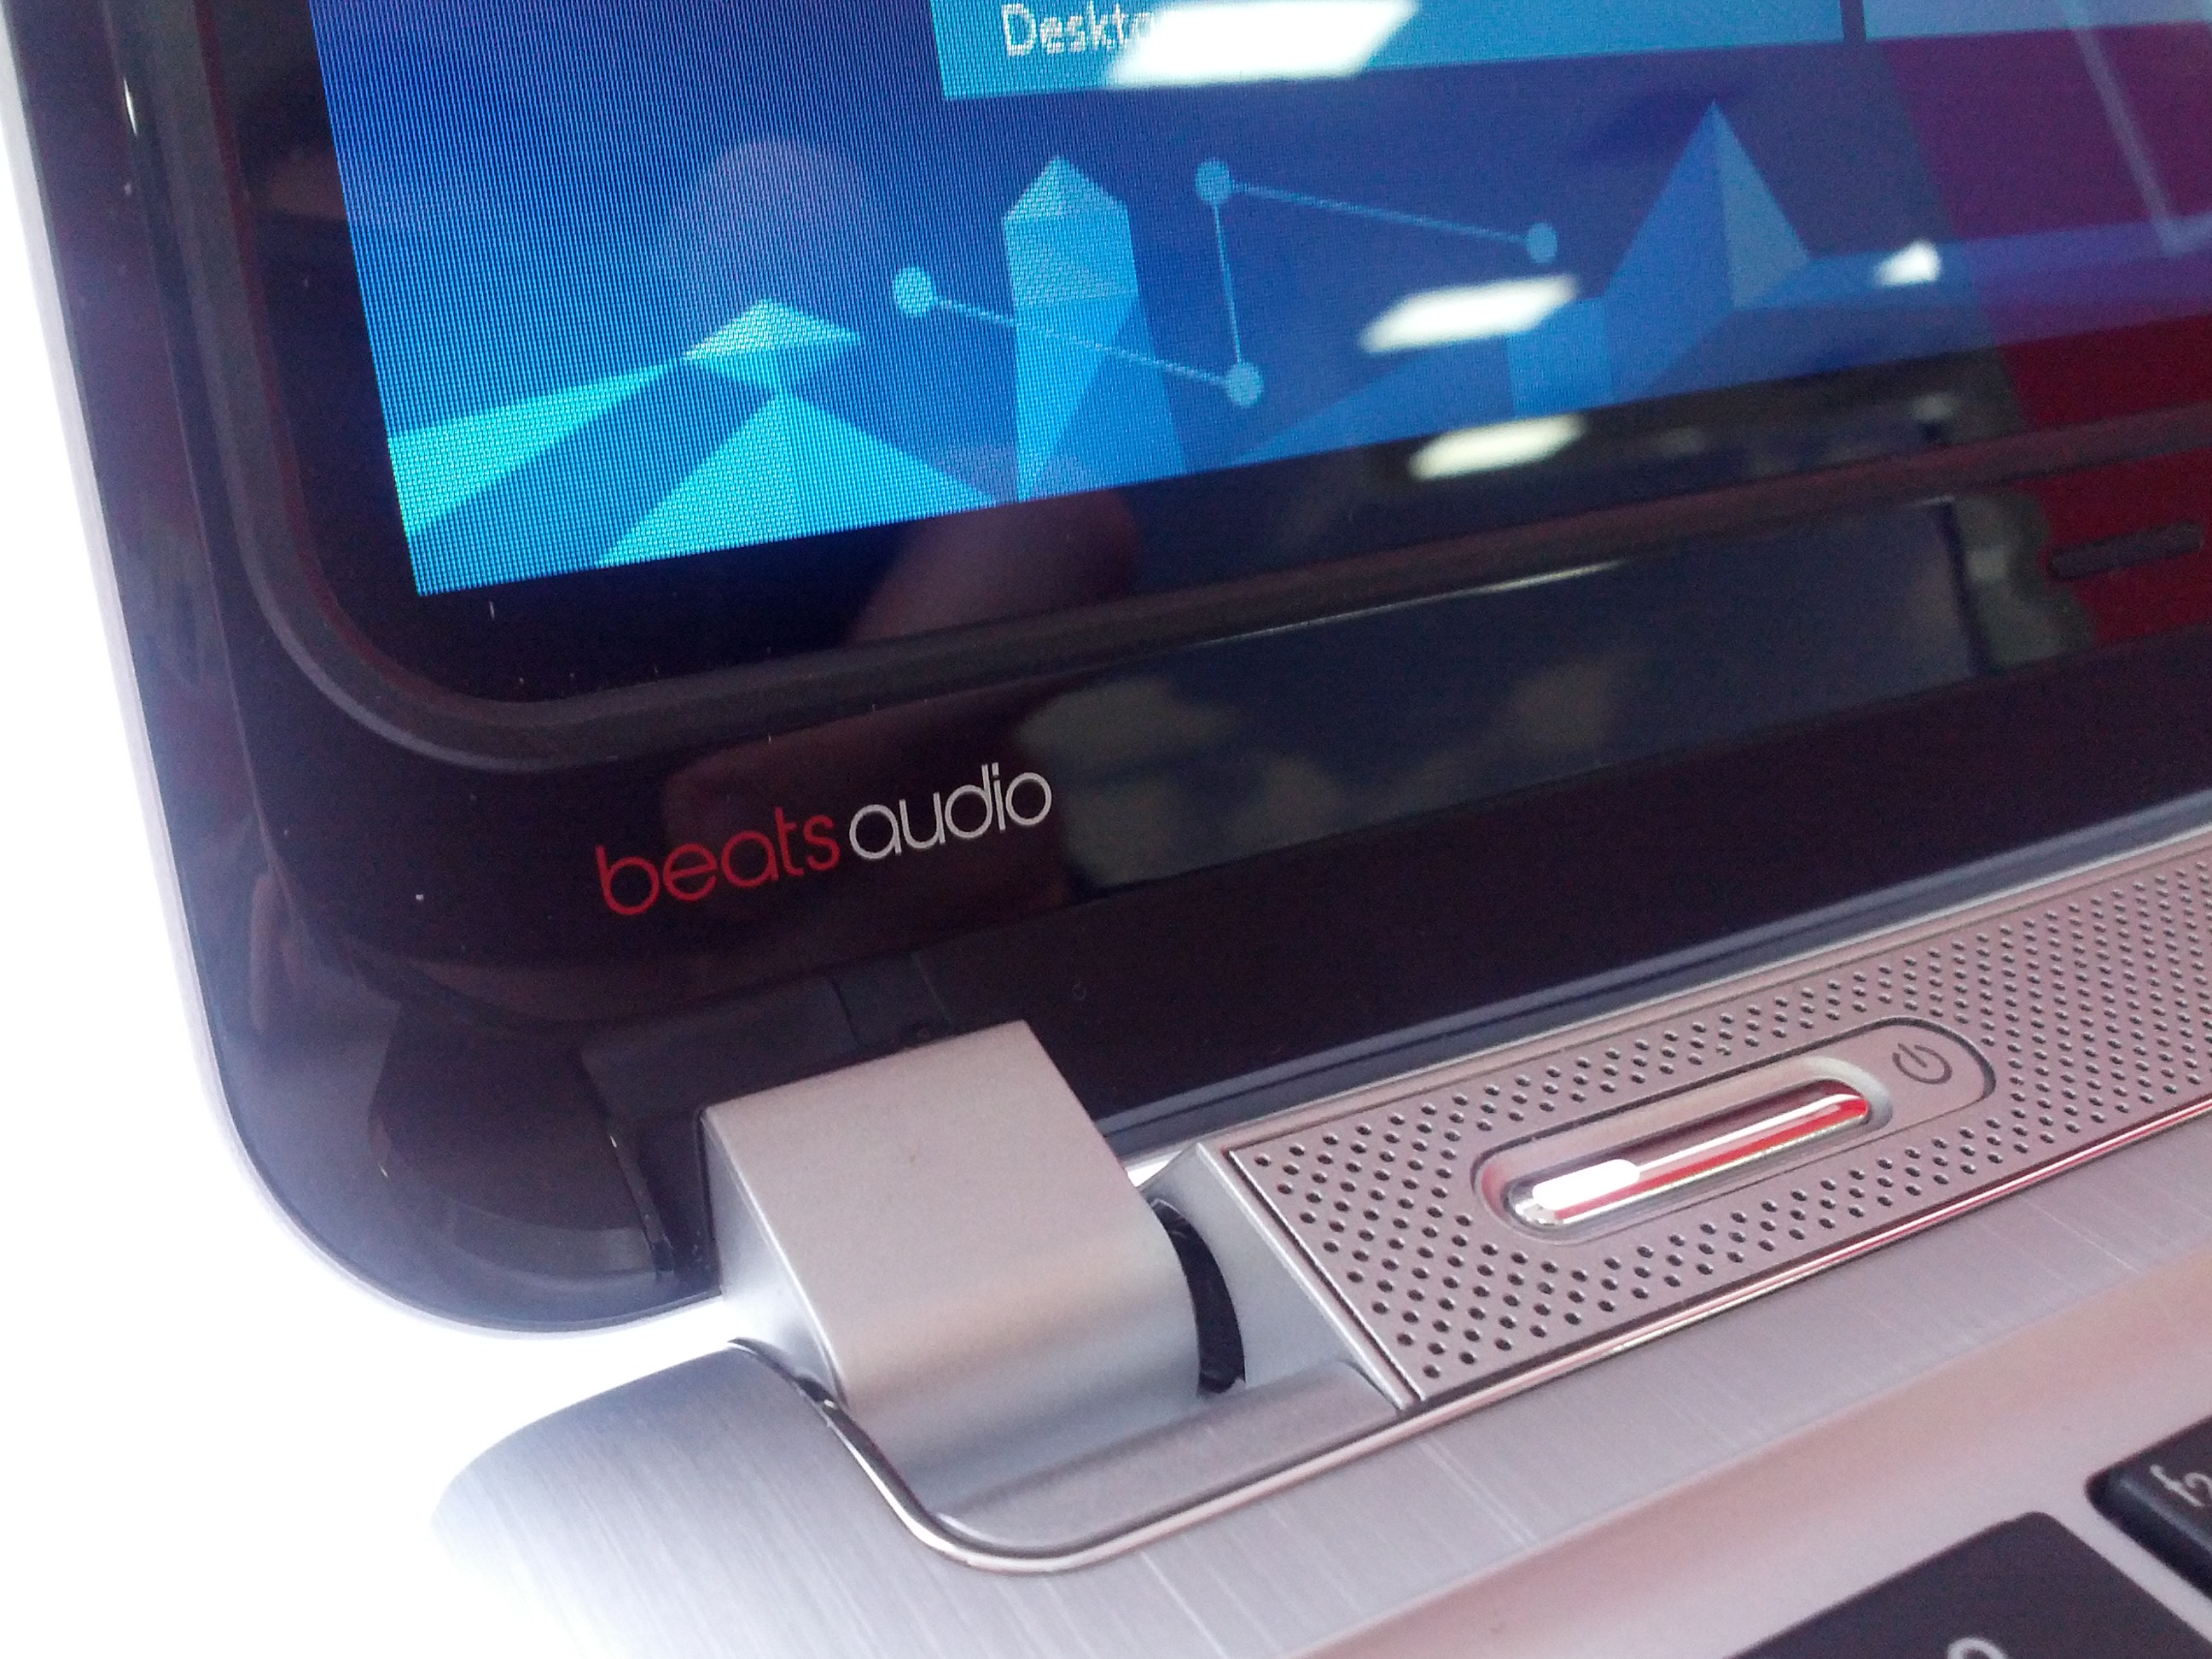 HP ENVY 13 Spectre XT - фирменная аккустика BeatsAudio